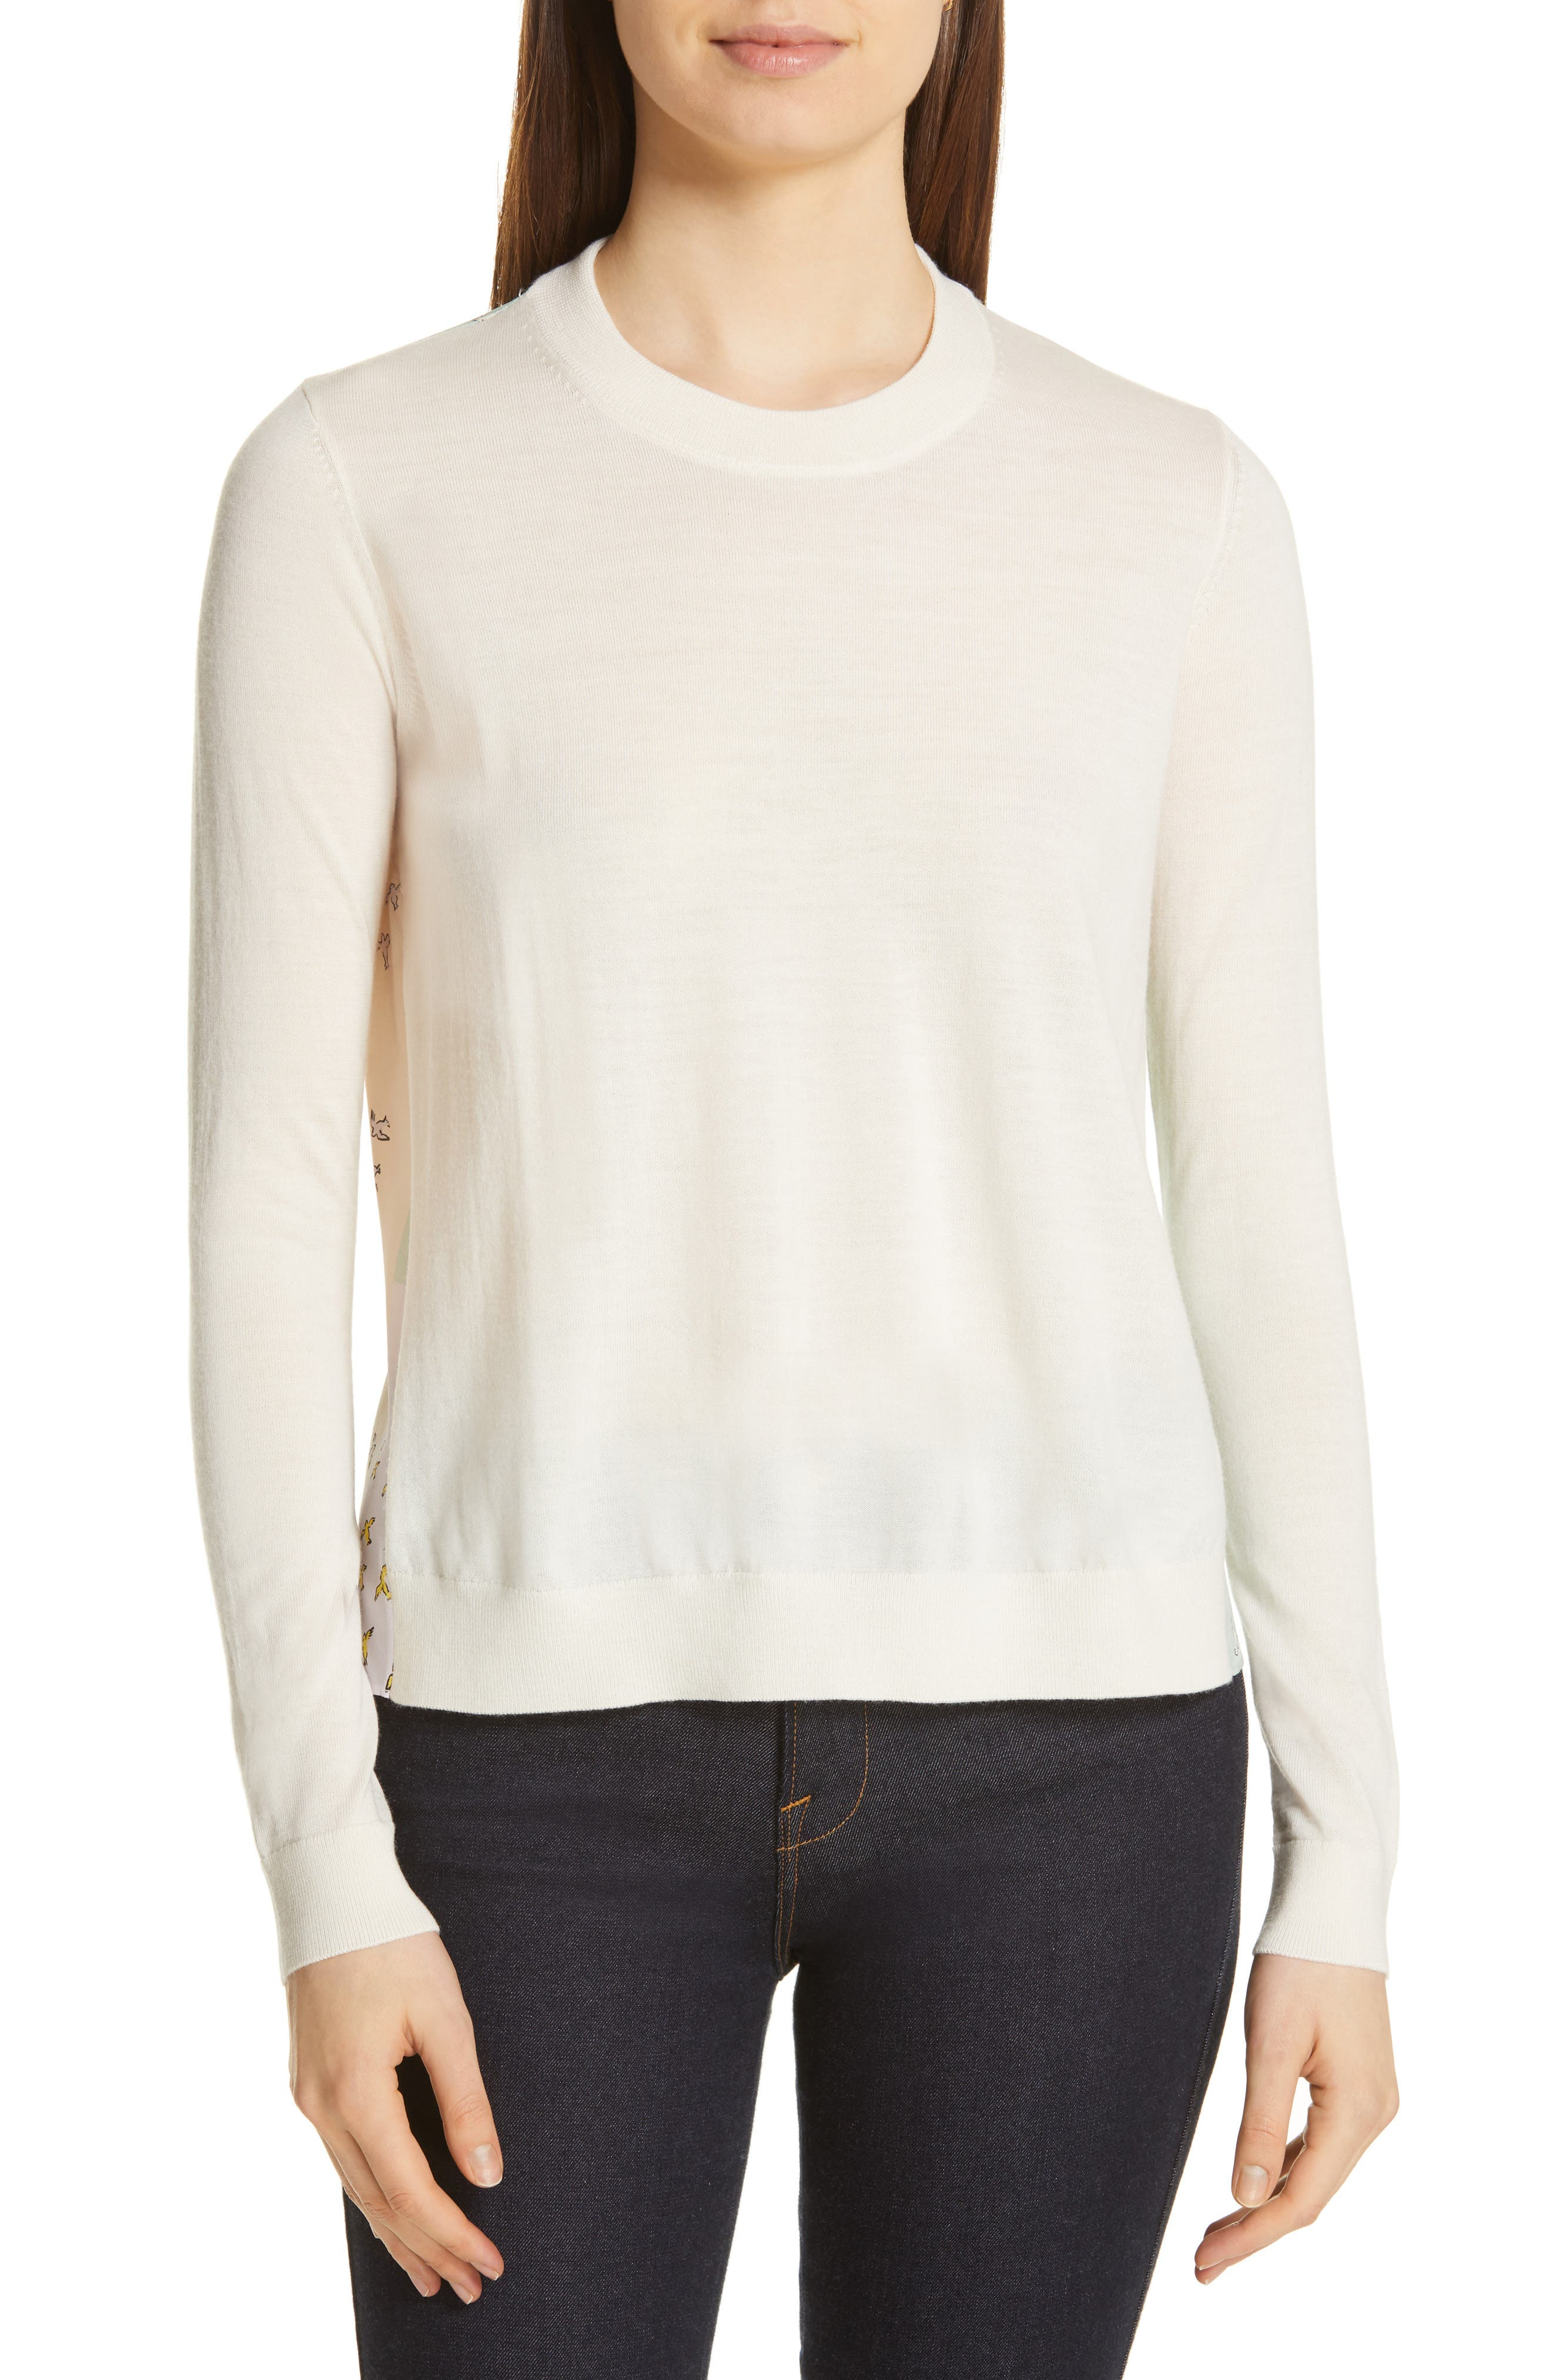 Tory Burch Silk Back Merino Wool Sweater, Ivory